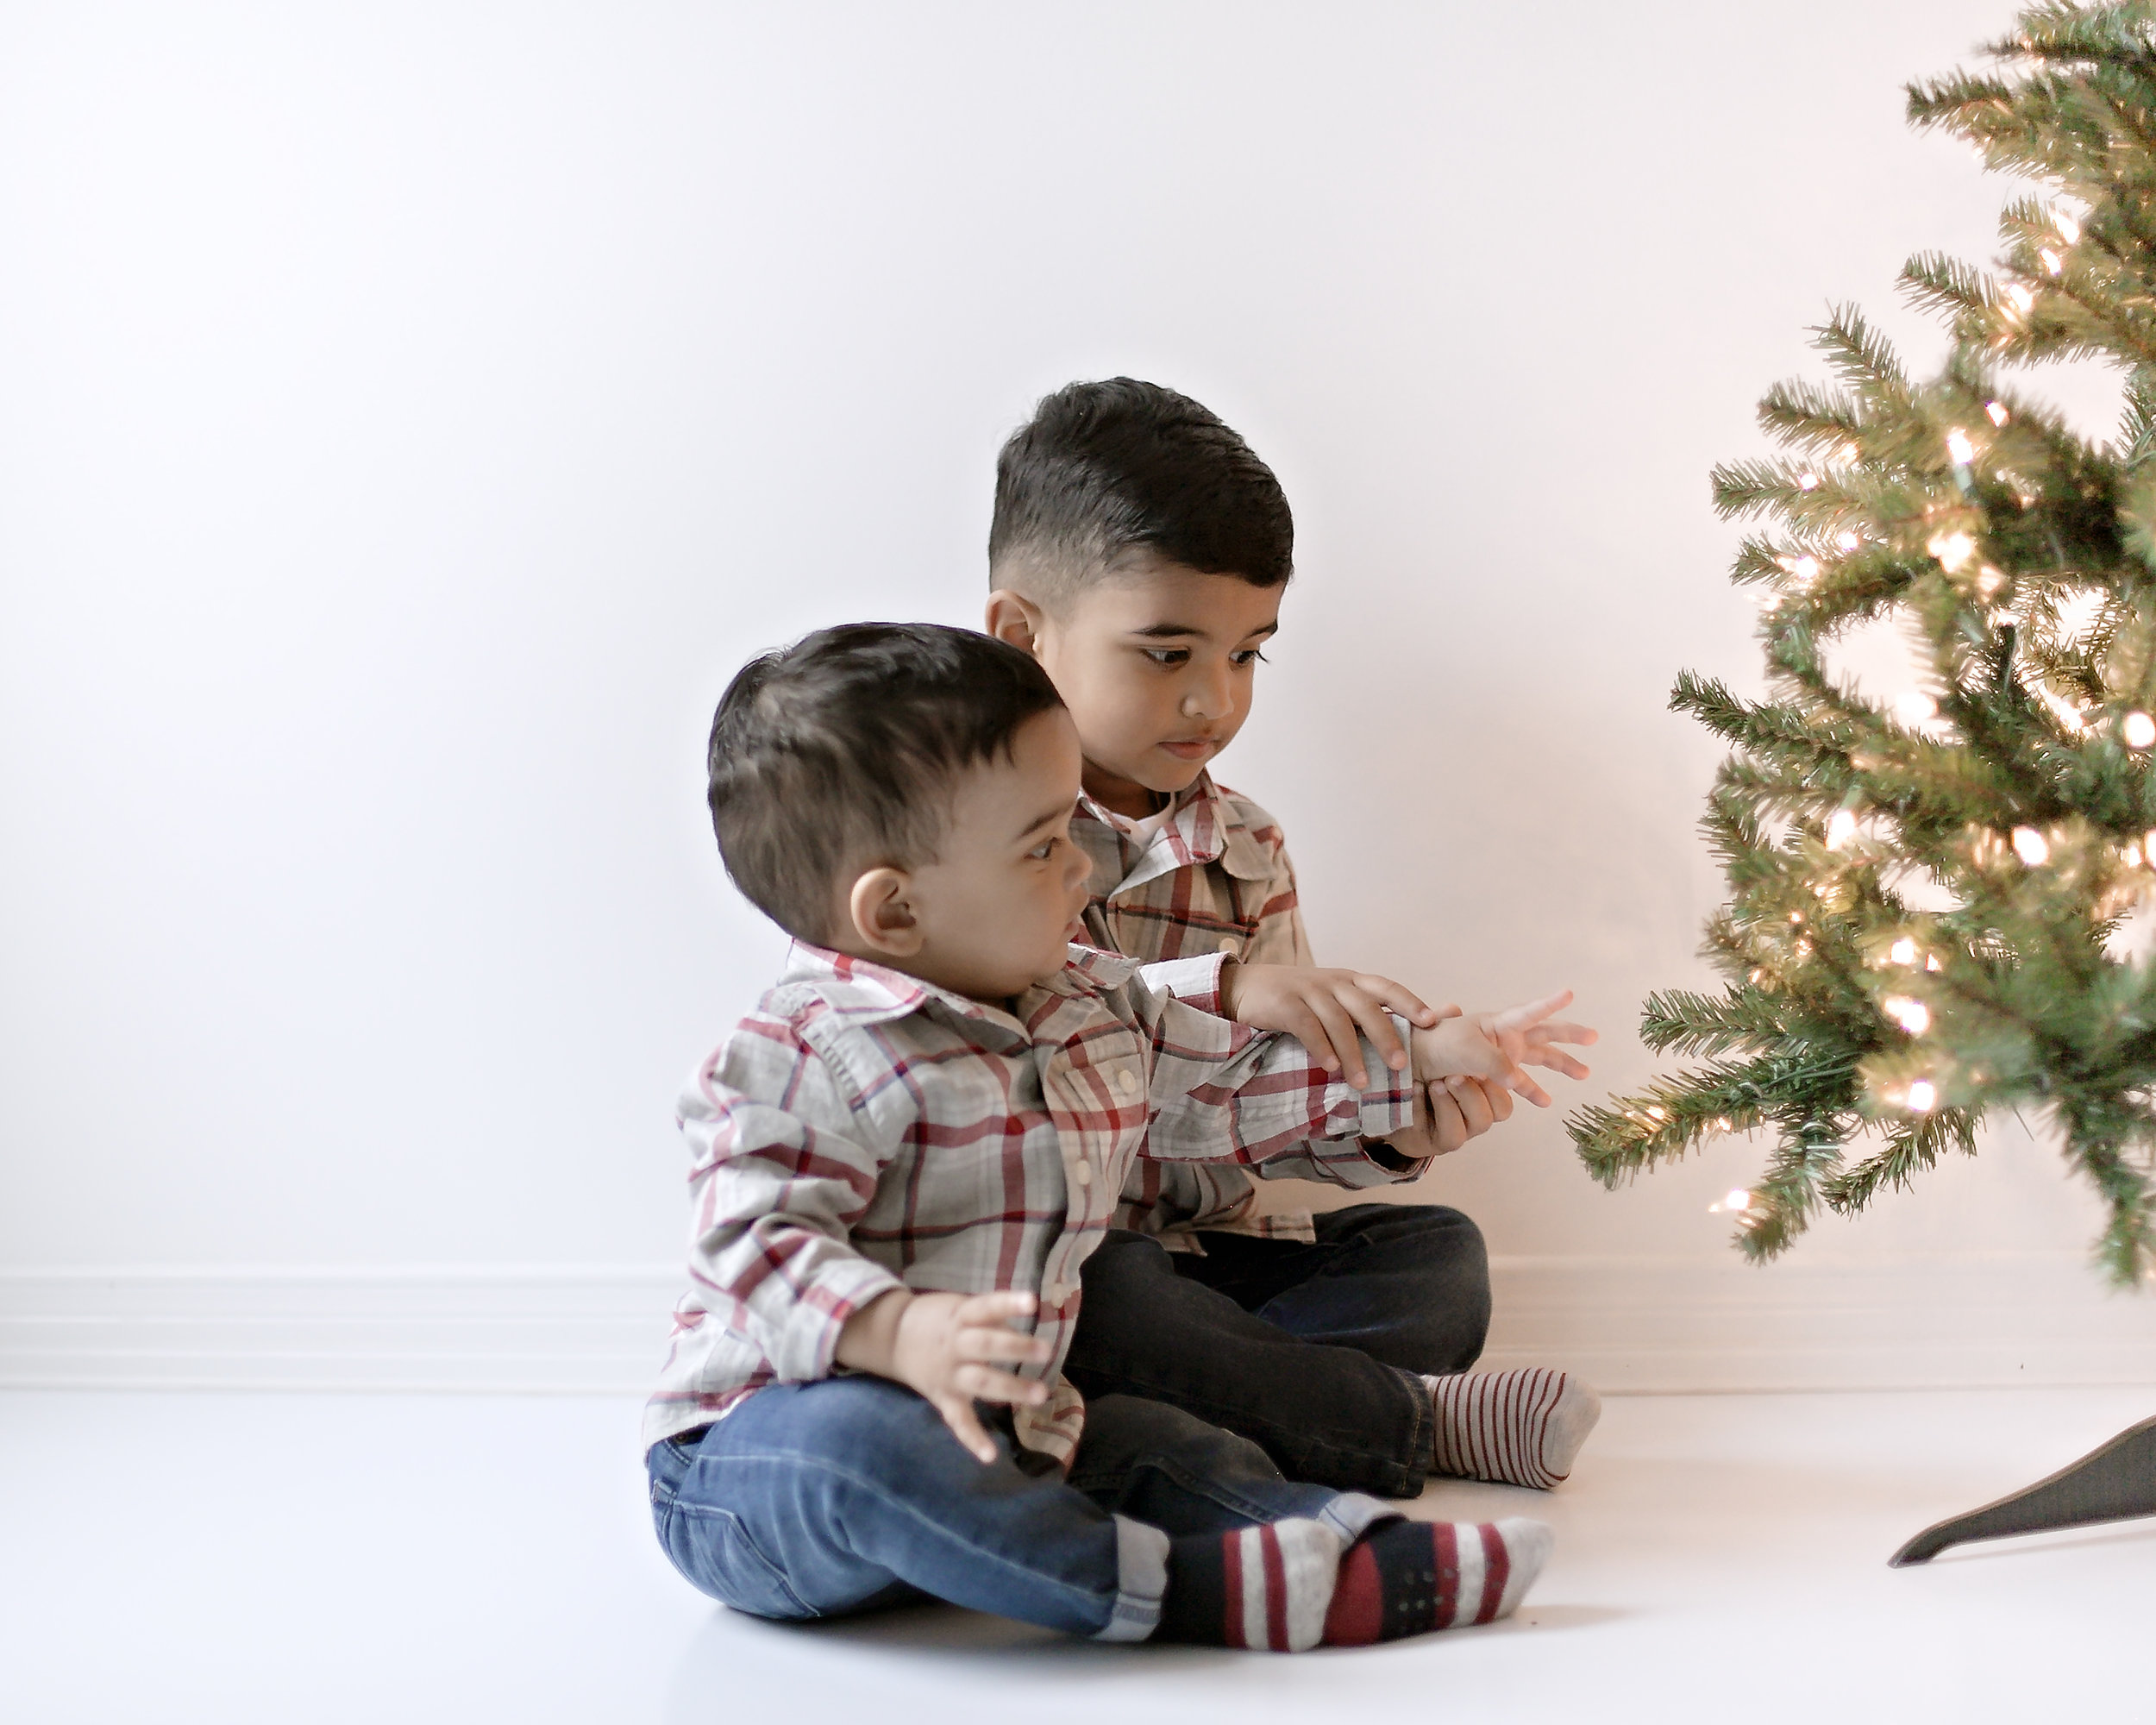 Petra_King_Photography_Family_Christmas_Portraits